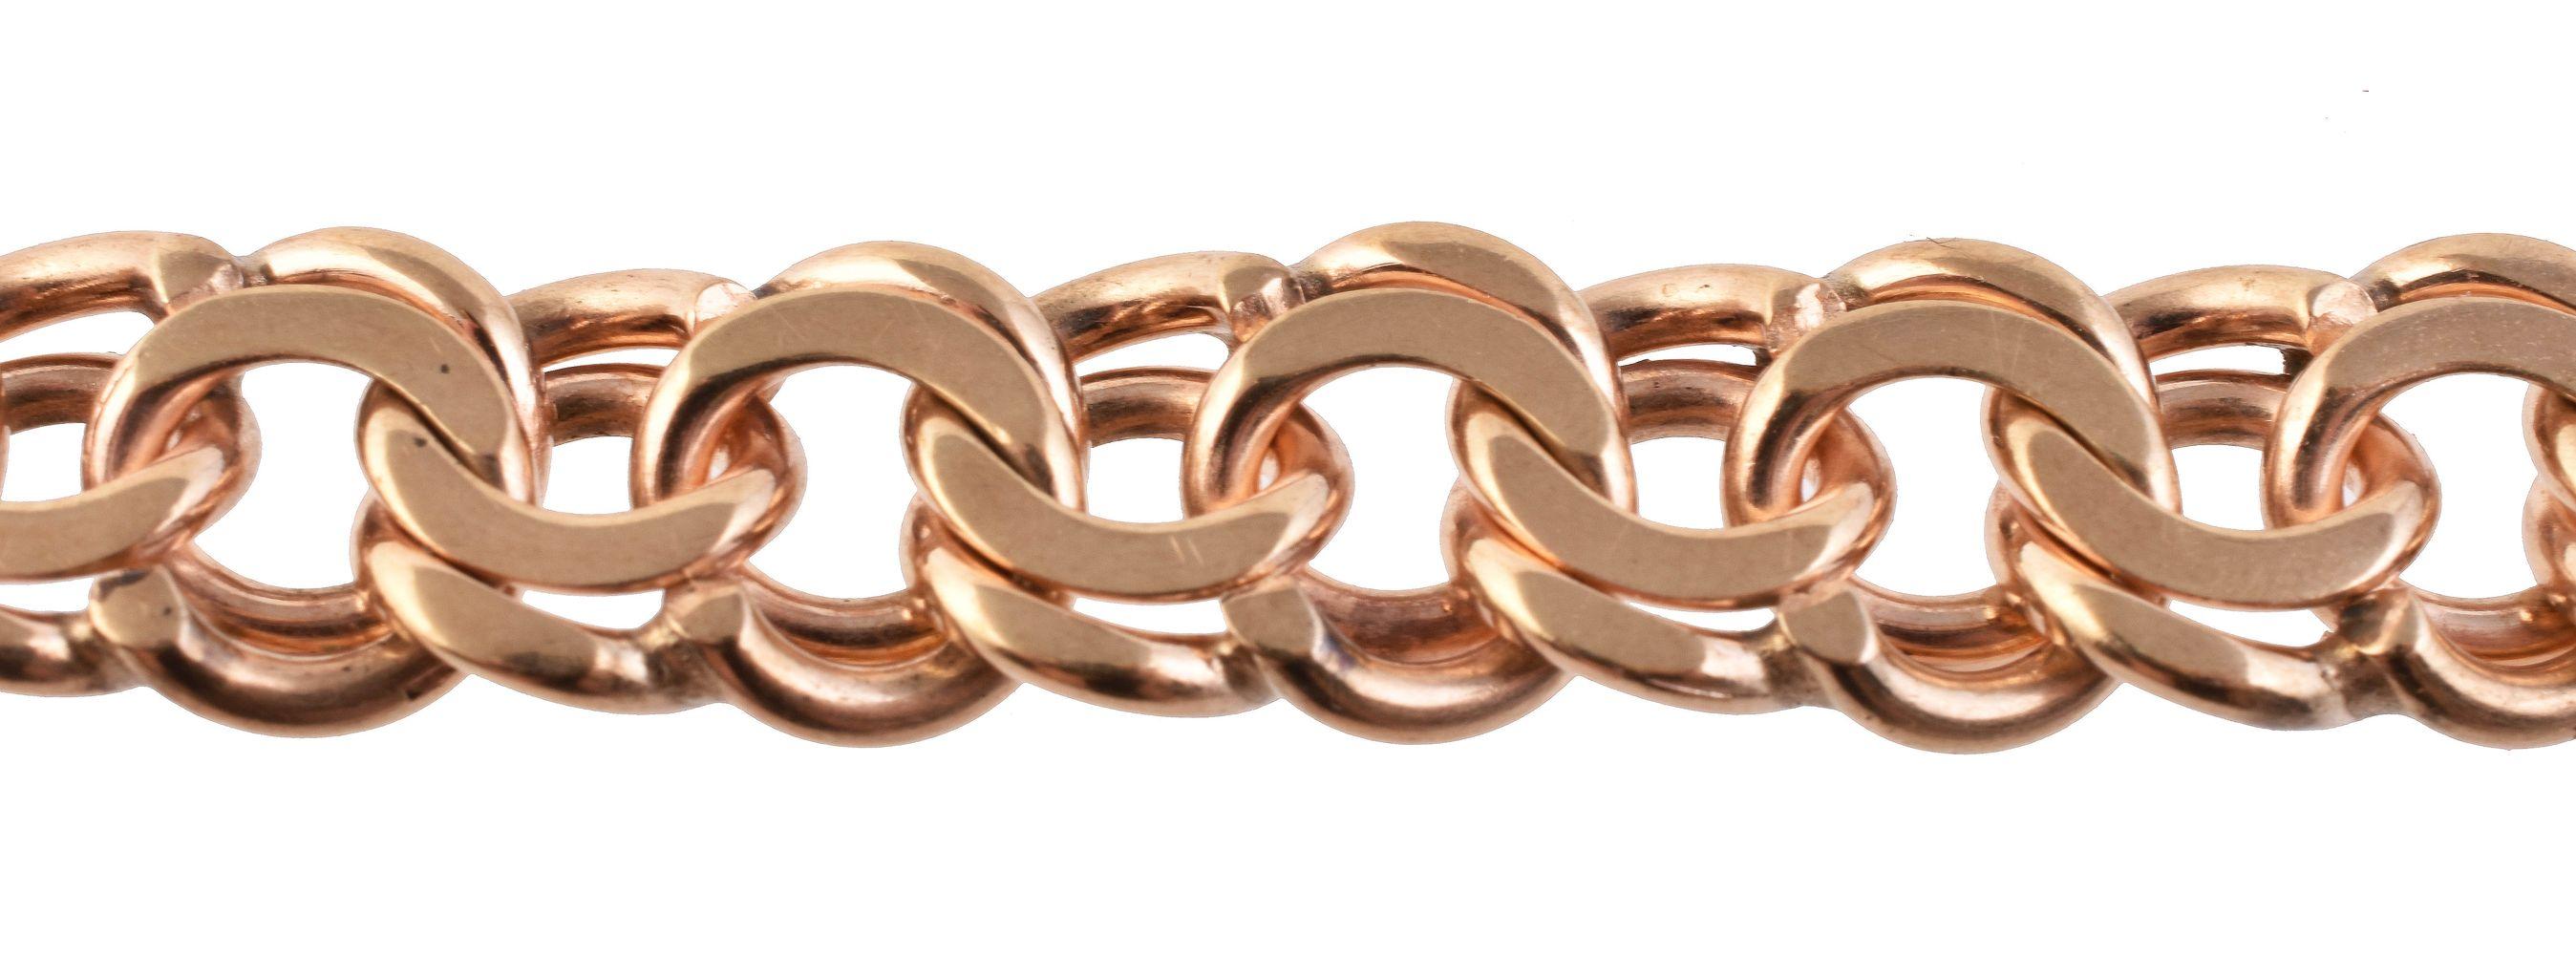 Lot 837 - A 9 carat gold bracelet and fob seal